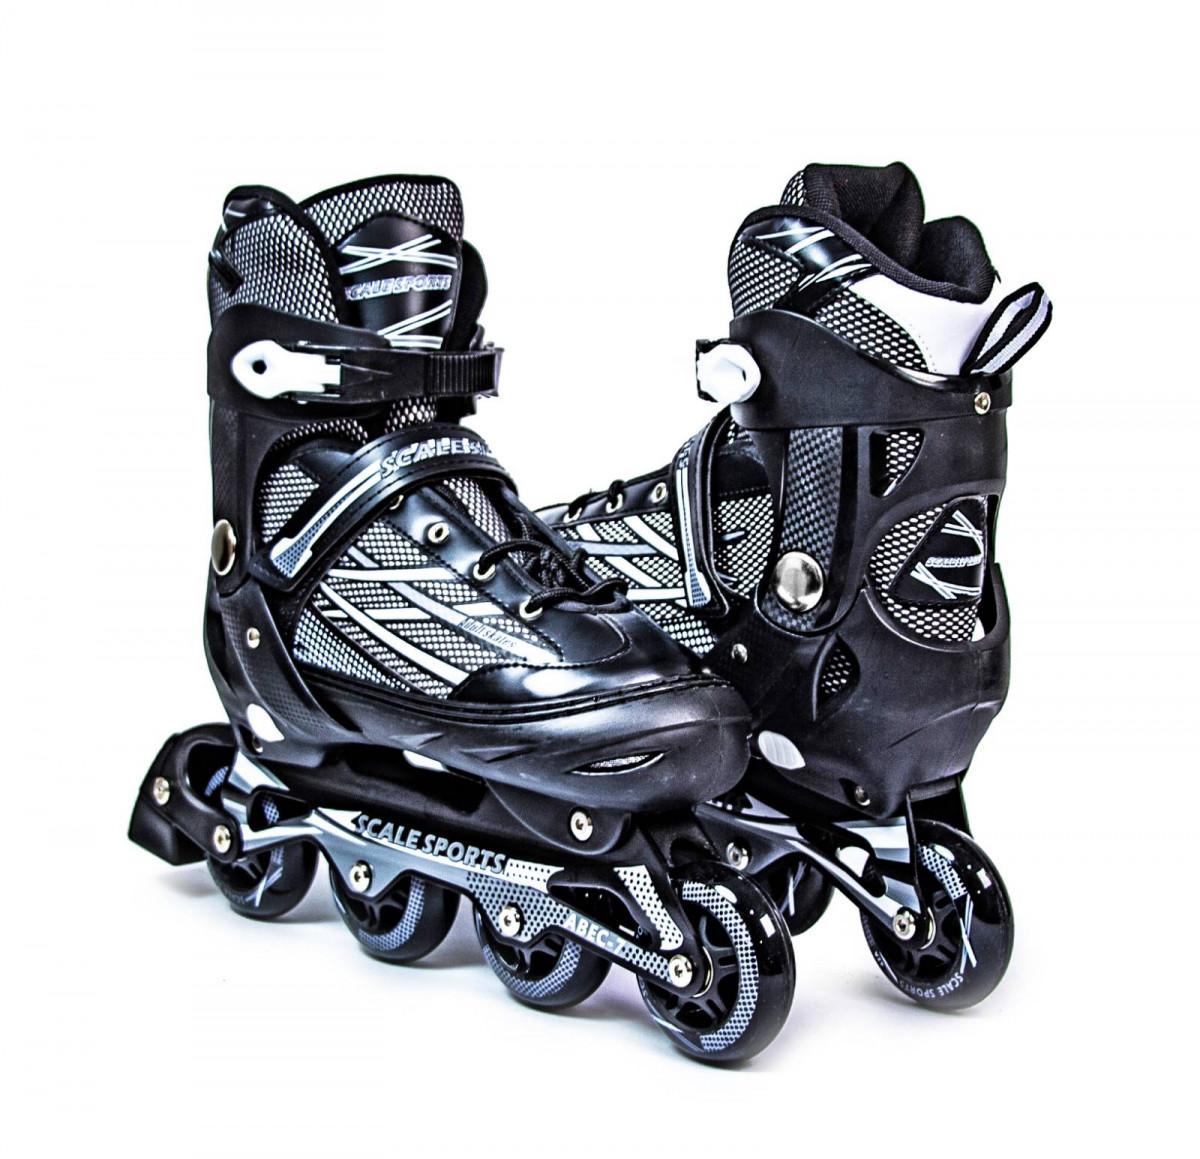 Ролики Scale Sports. Adult Skates. Black 41-44